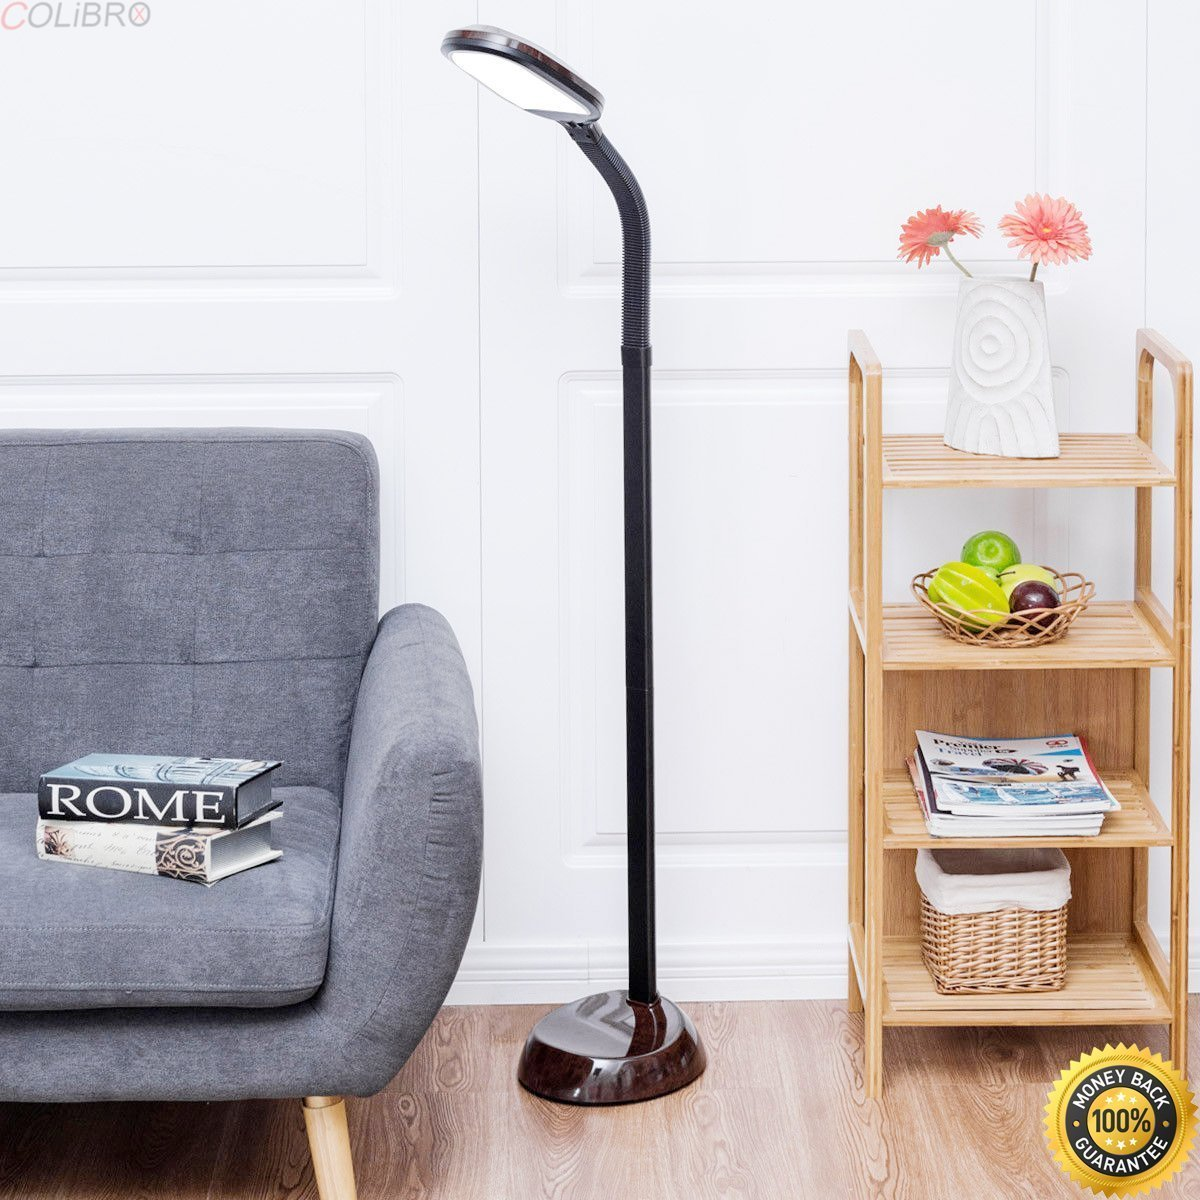 COLIBROX--LED Reading Light Standing Floor Lamp Adjustable Gooseneck Energy Saving Walnut,home depot floor lamps,floor lamps for living room,modern floor lamps,standing lamps,amazon floor lamps sale.